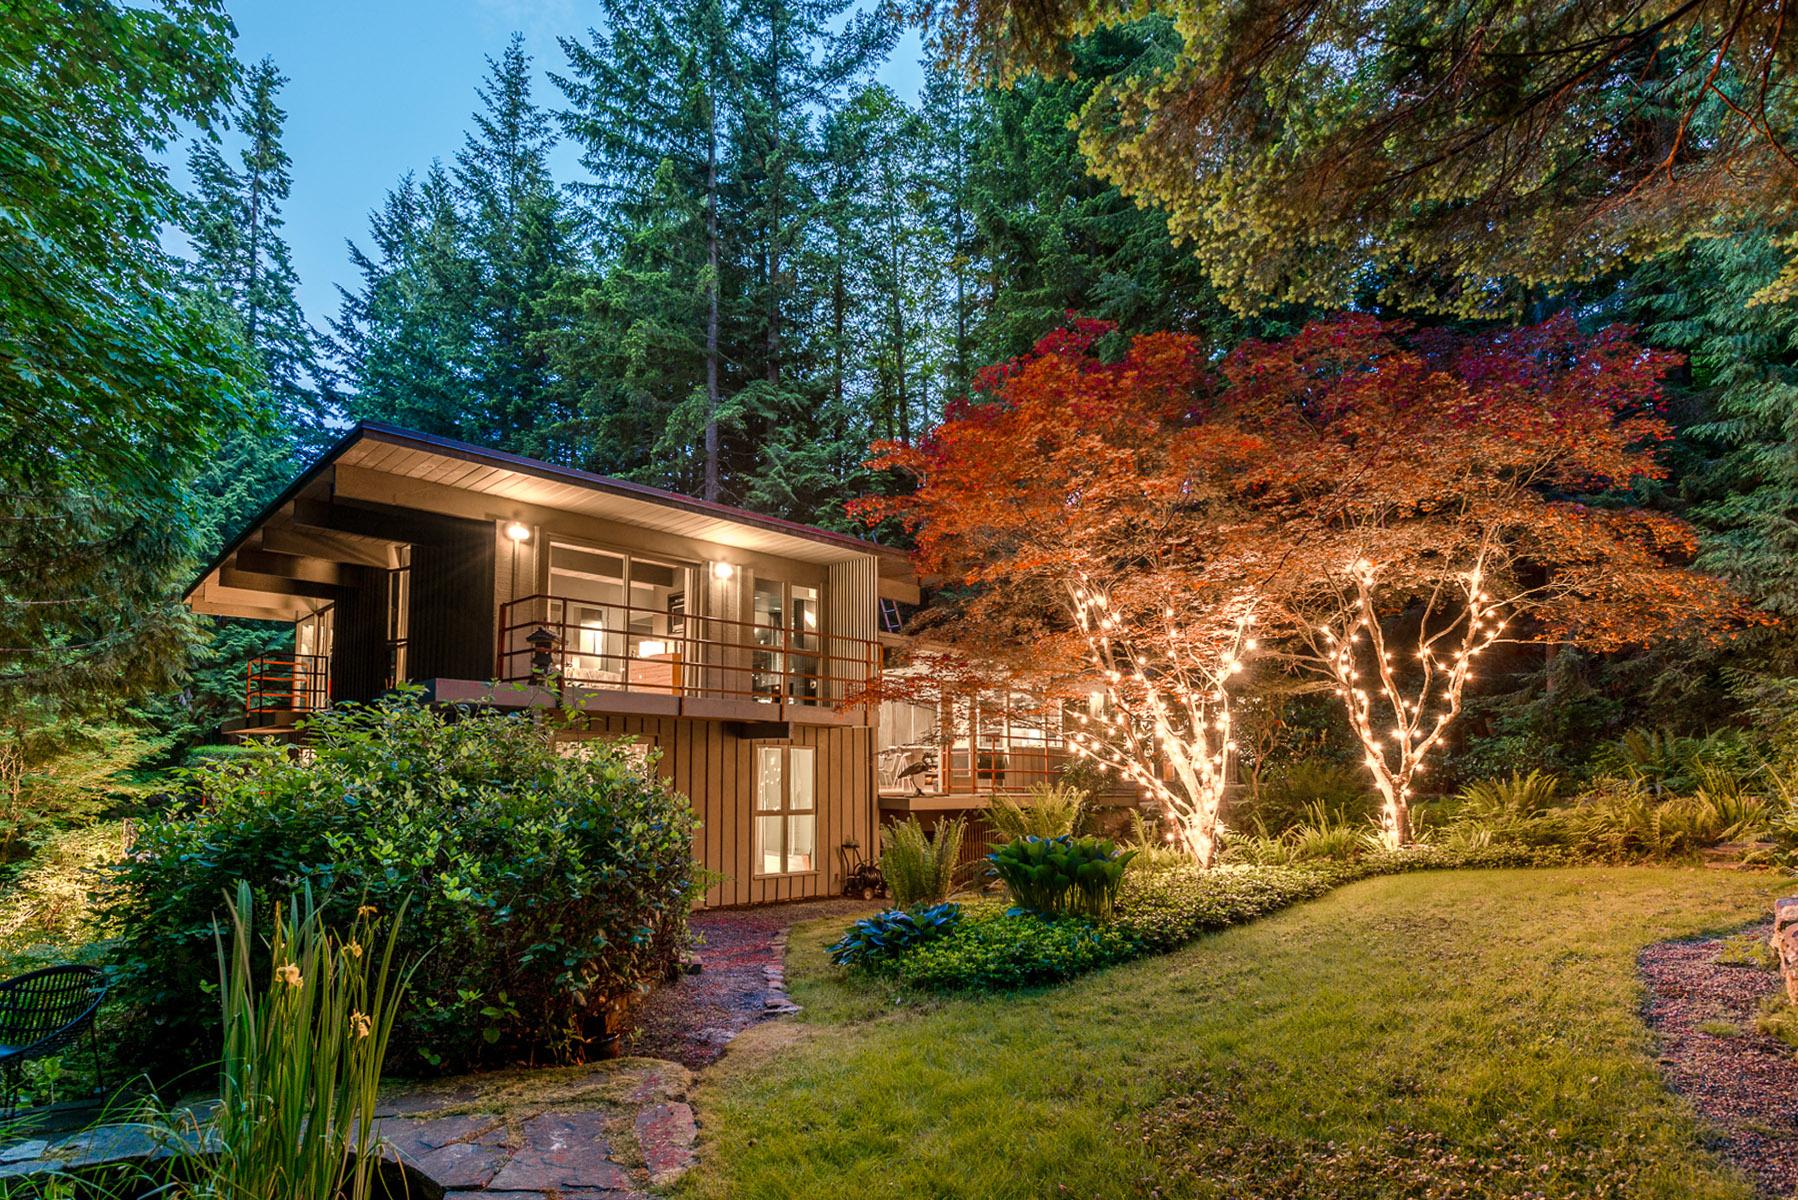 4301-Woodcrest-Road-West-Vancouver-360hometours-16s.jpg